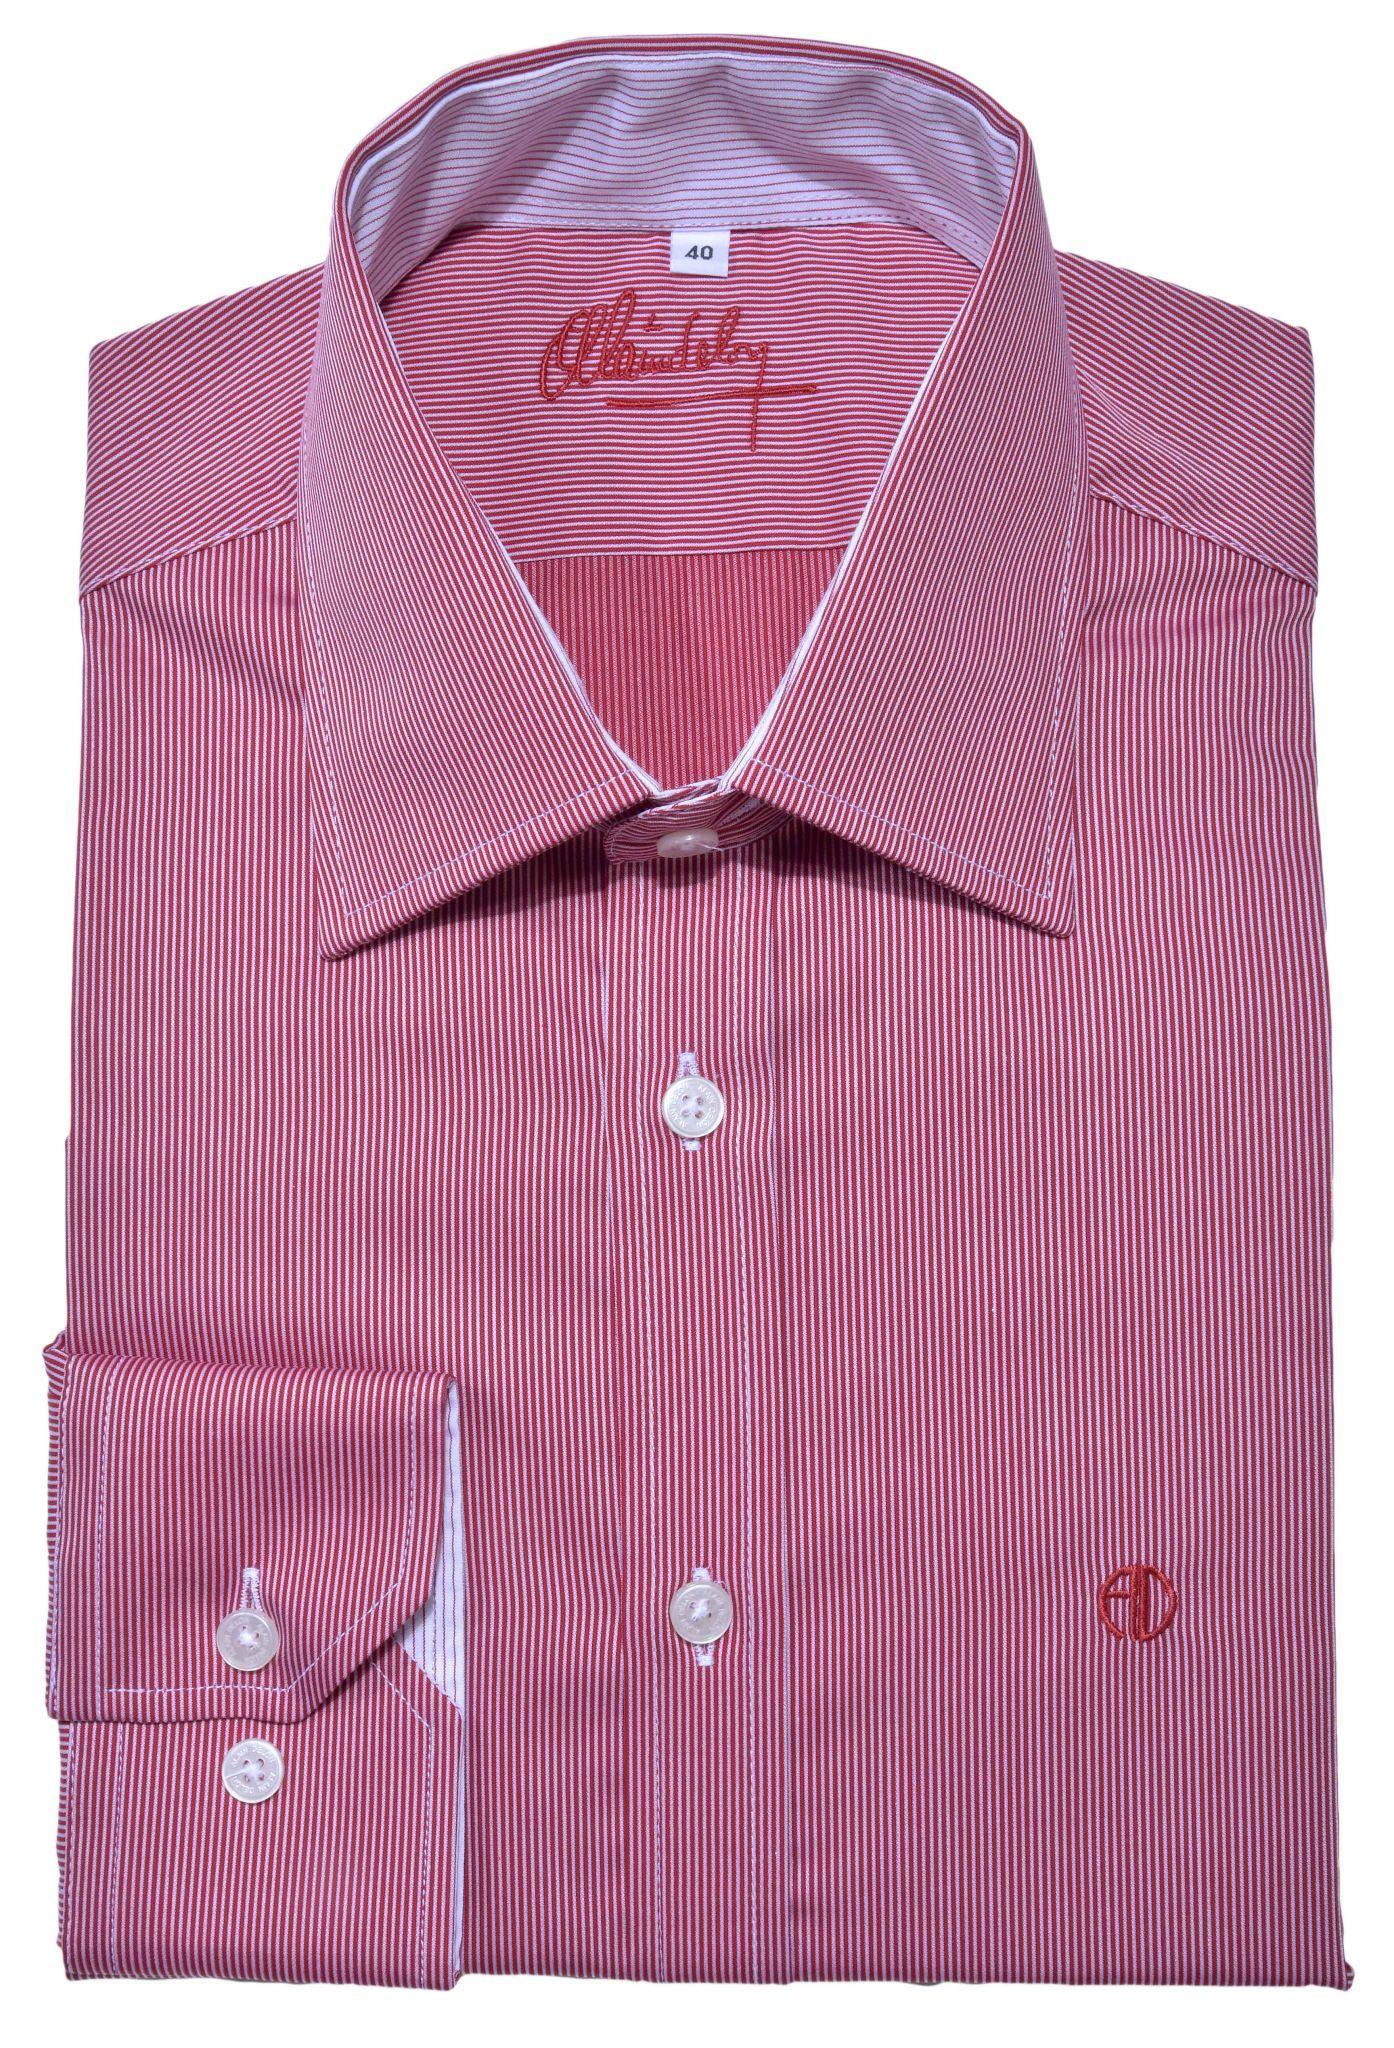 Red Extra Slim Fit Shirt Shirts E Shop